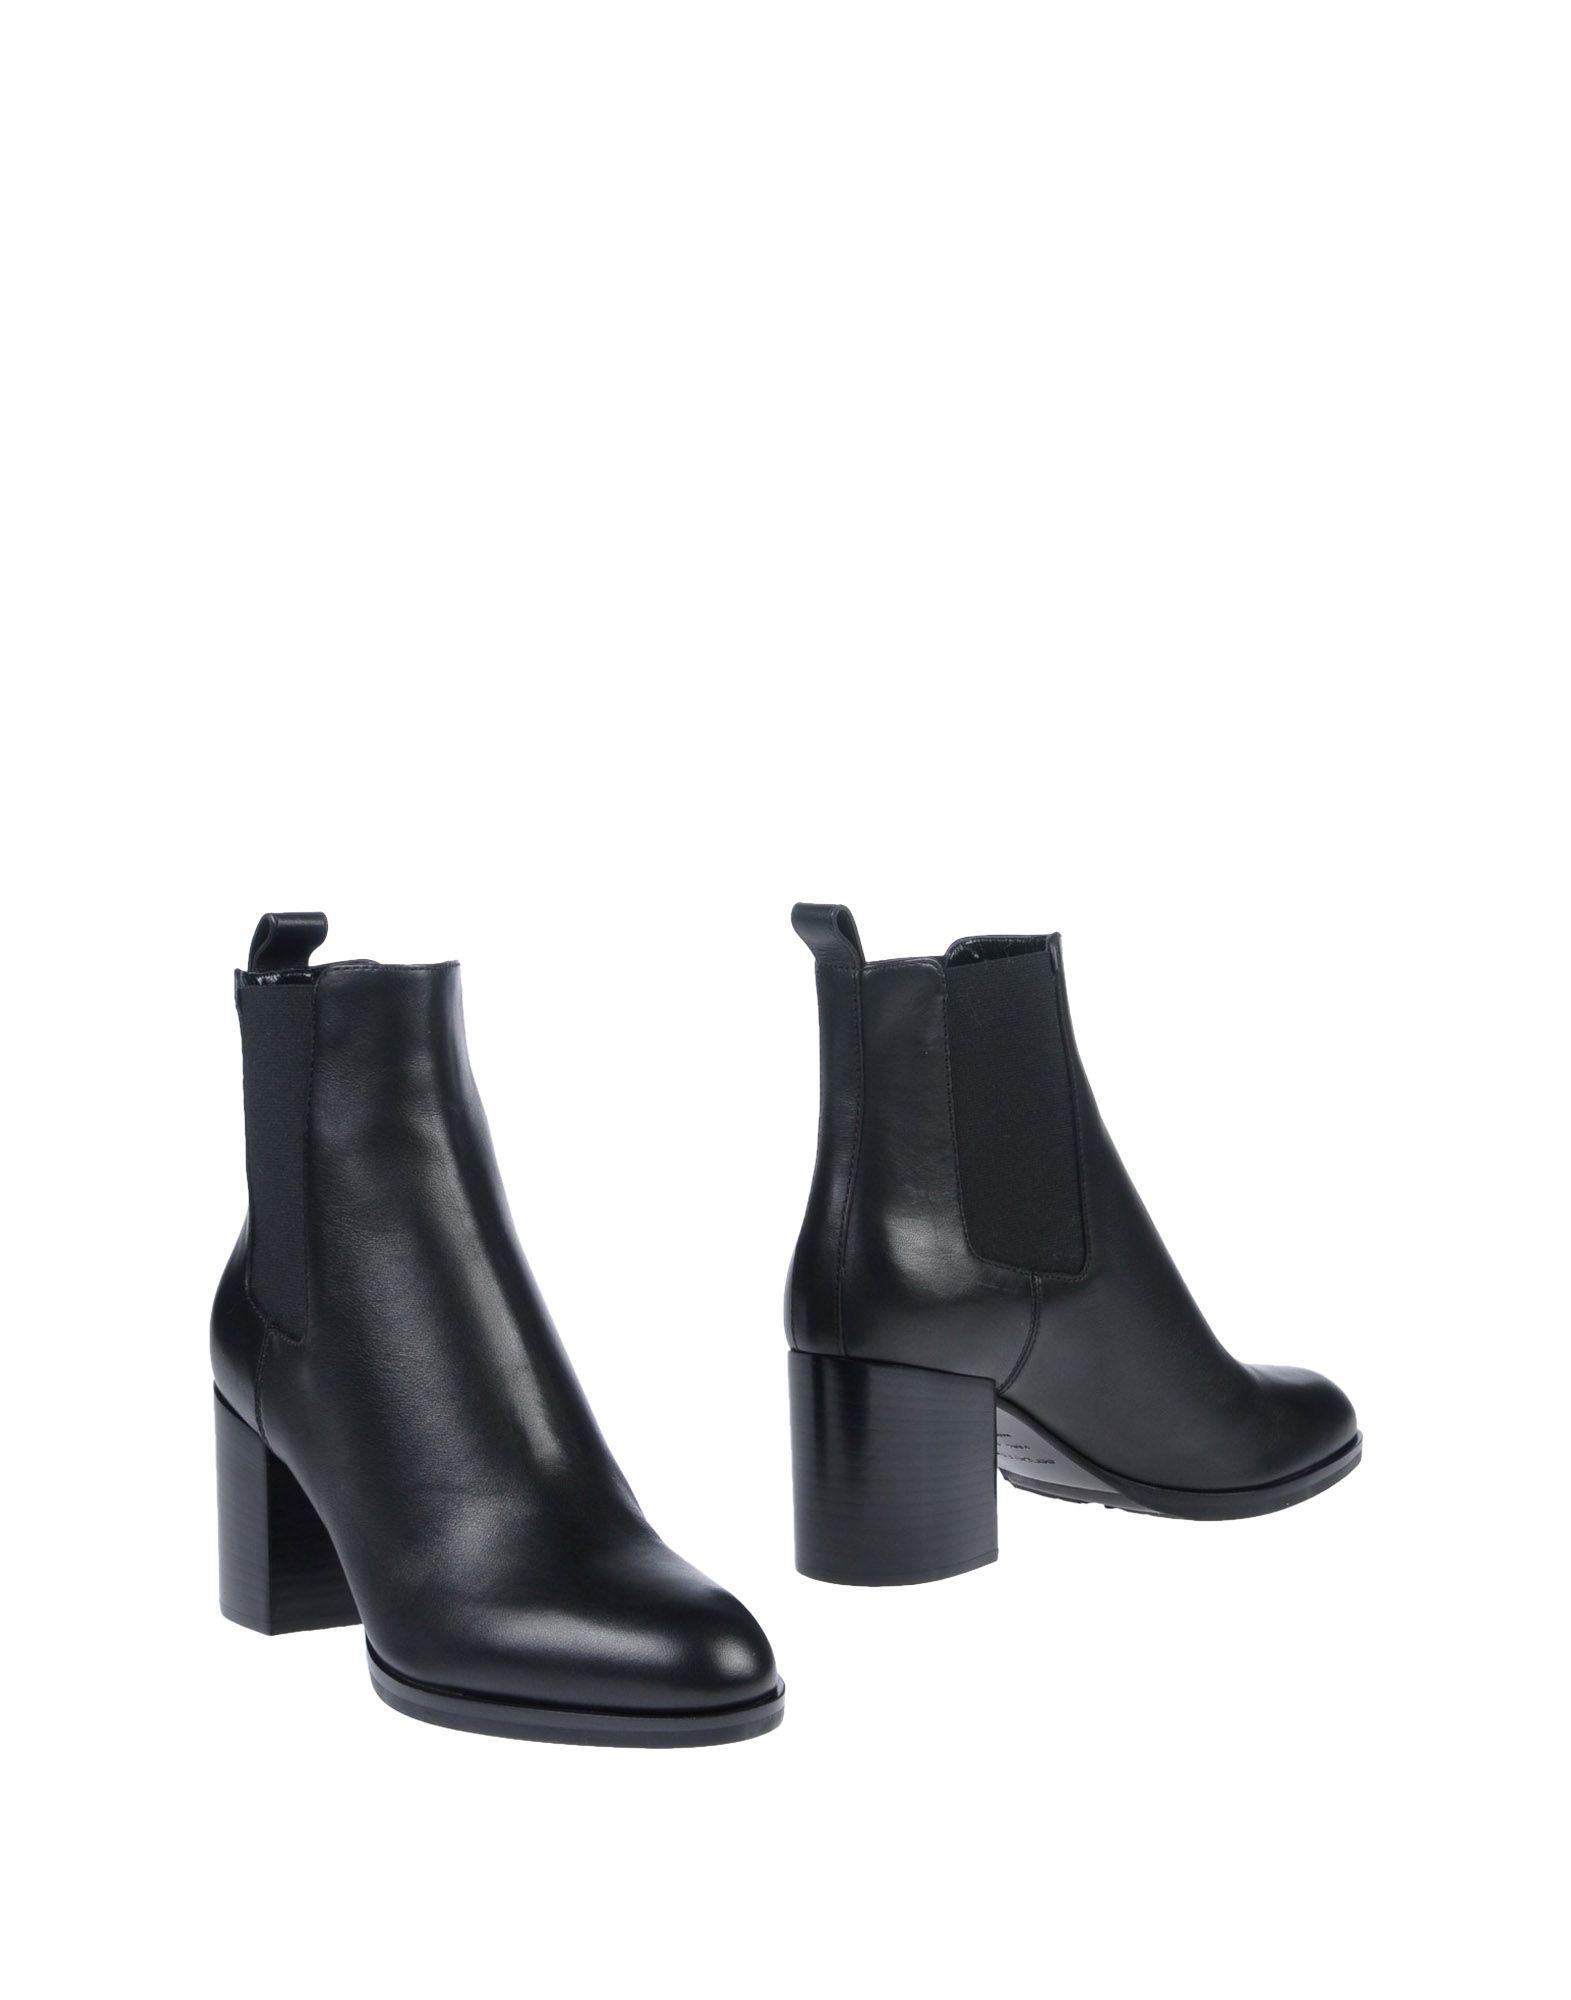 SERGIO ROSSI Полусапоги и высокие ботинки osvaldo rossi полусапоги и высокие ботинки